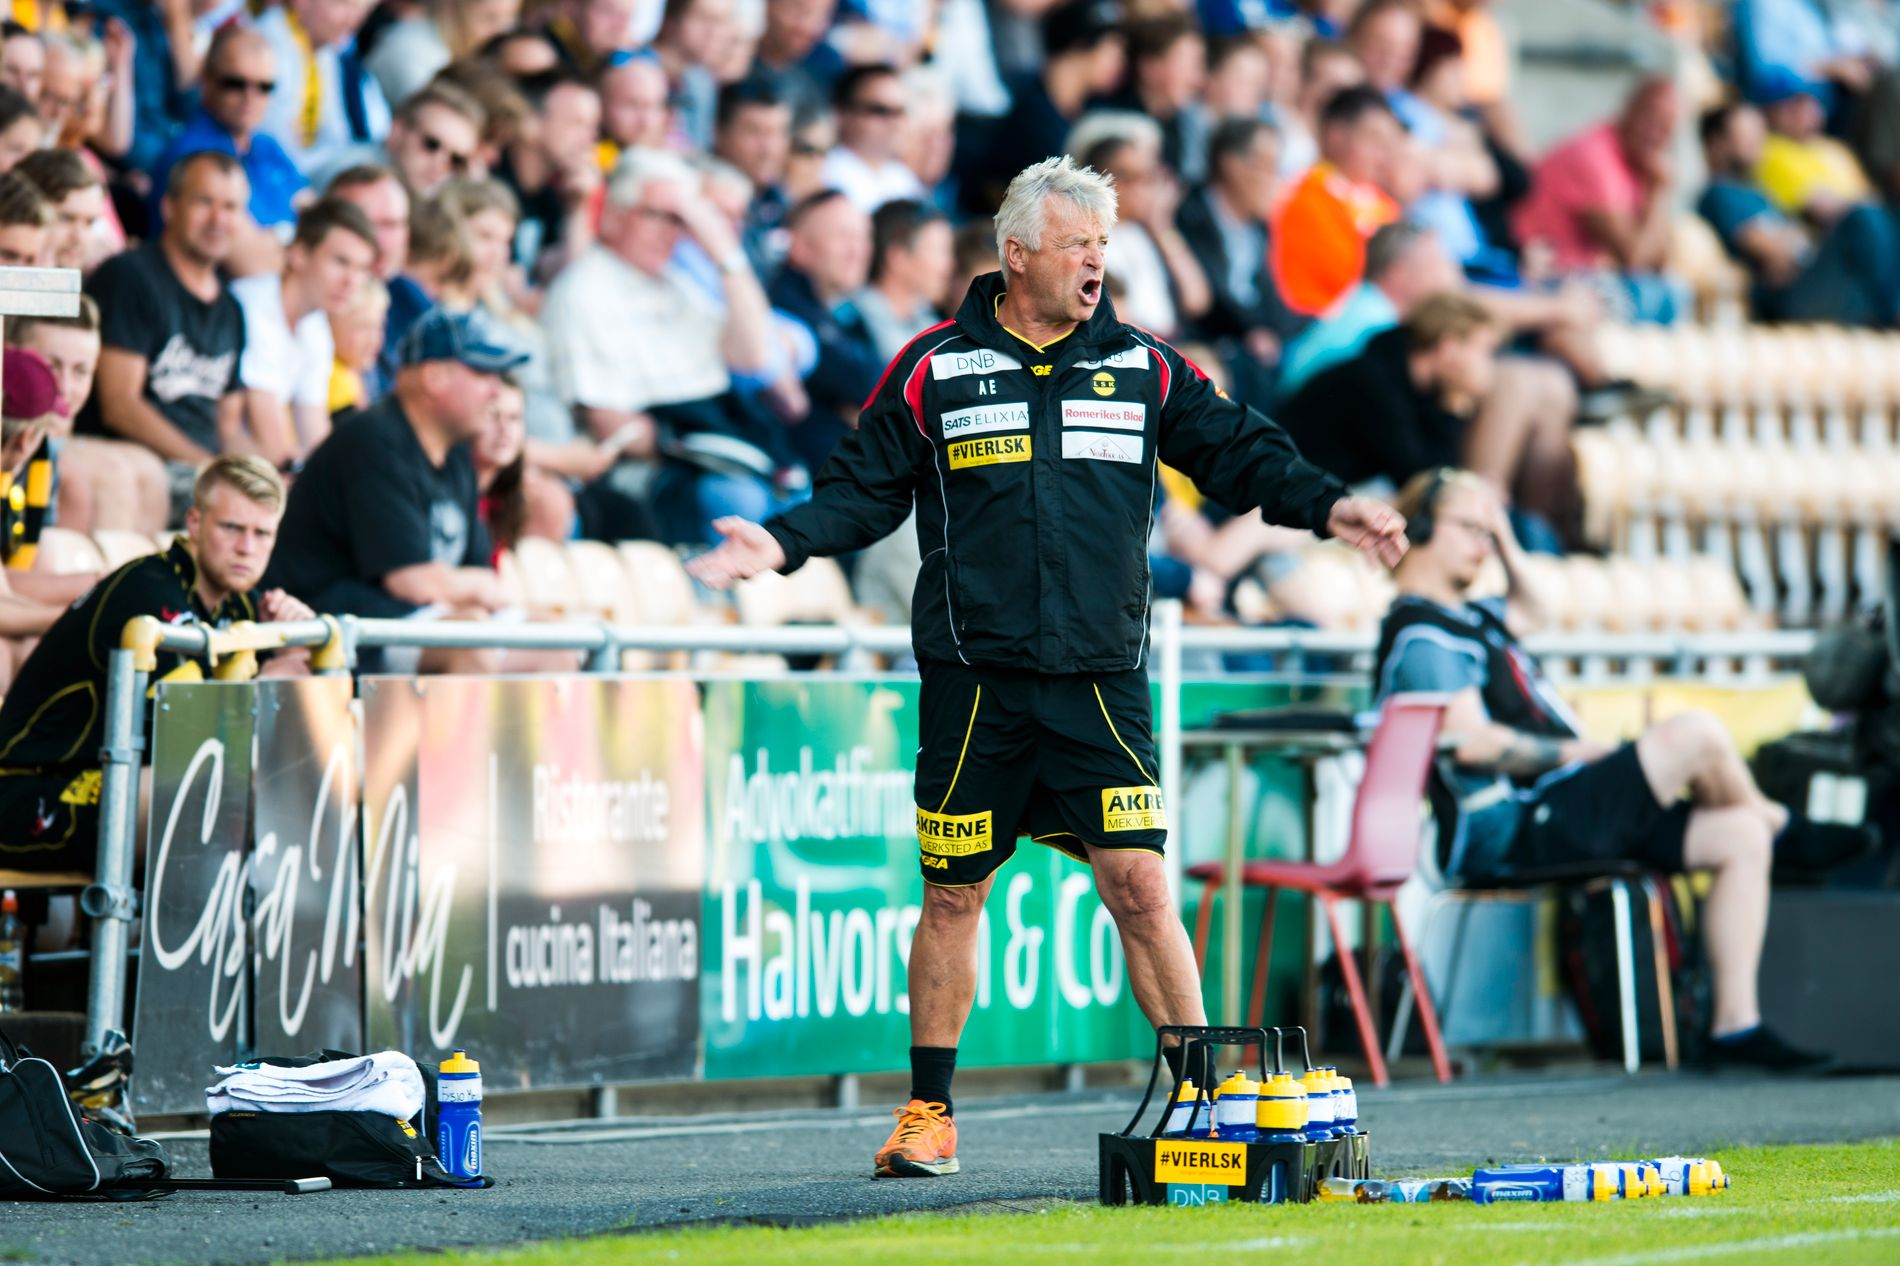 TYDELIG: Arne Erlandsen avbildet underveis i 1. omgang mot Stabæk. Da var han aktiv på sidelinjen mens Lillestrøm slet.